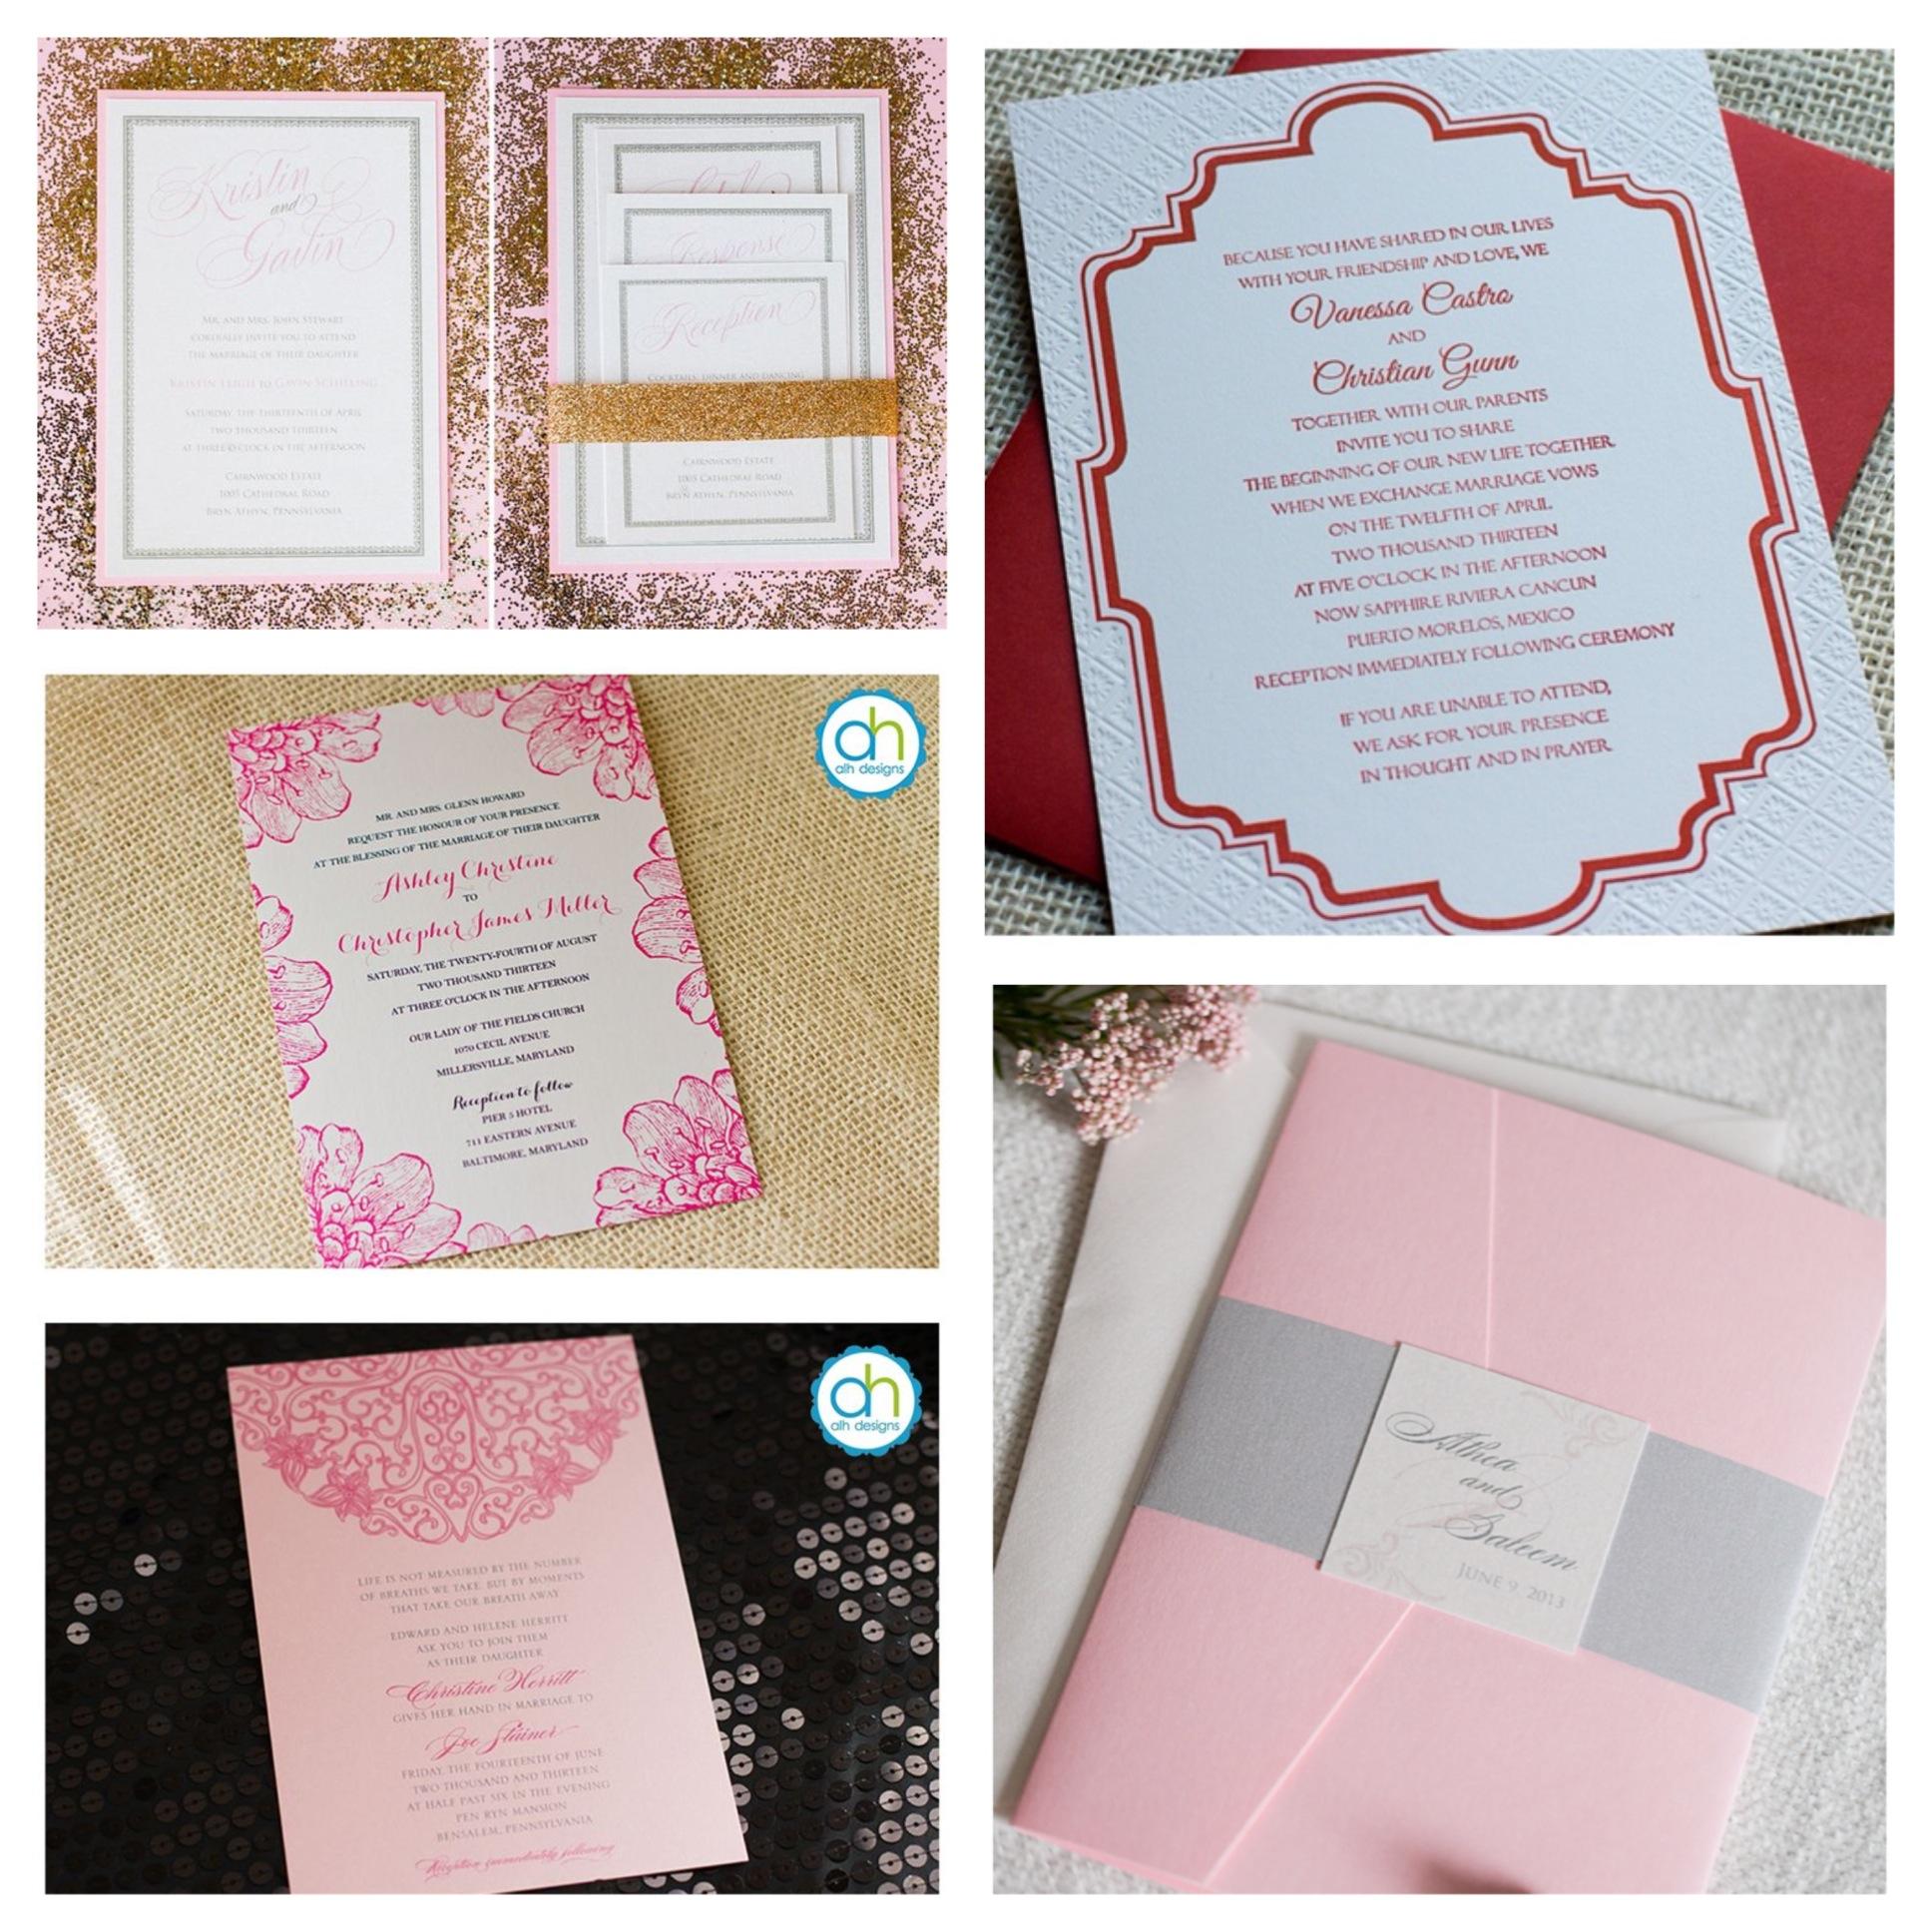 april_lynn_designs, top pins of 2013, wedding invitations